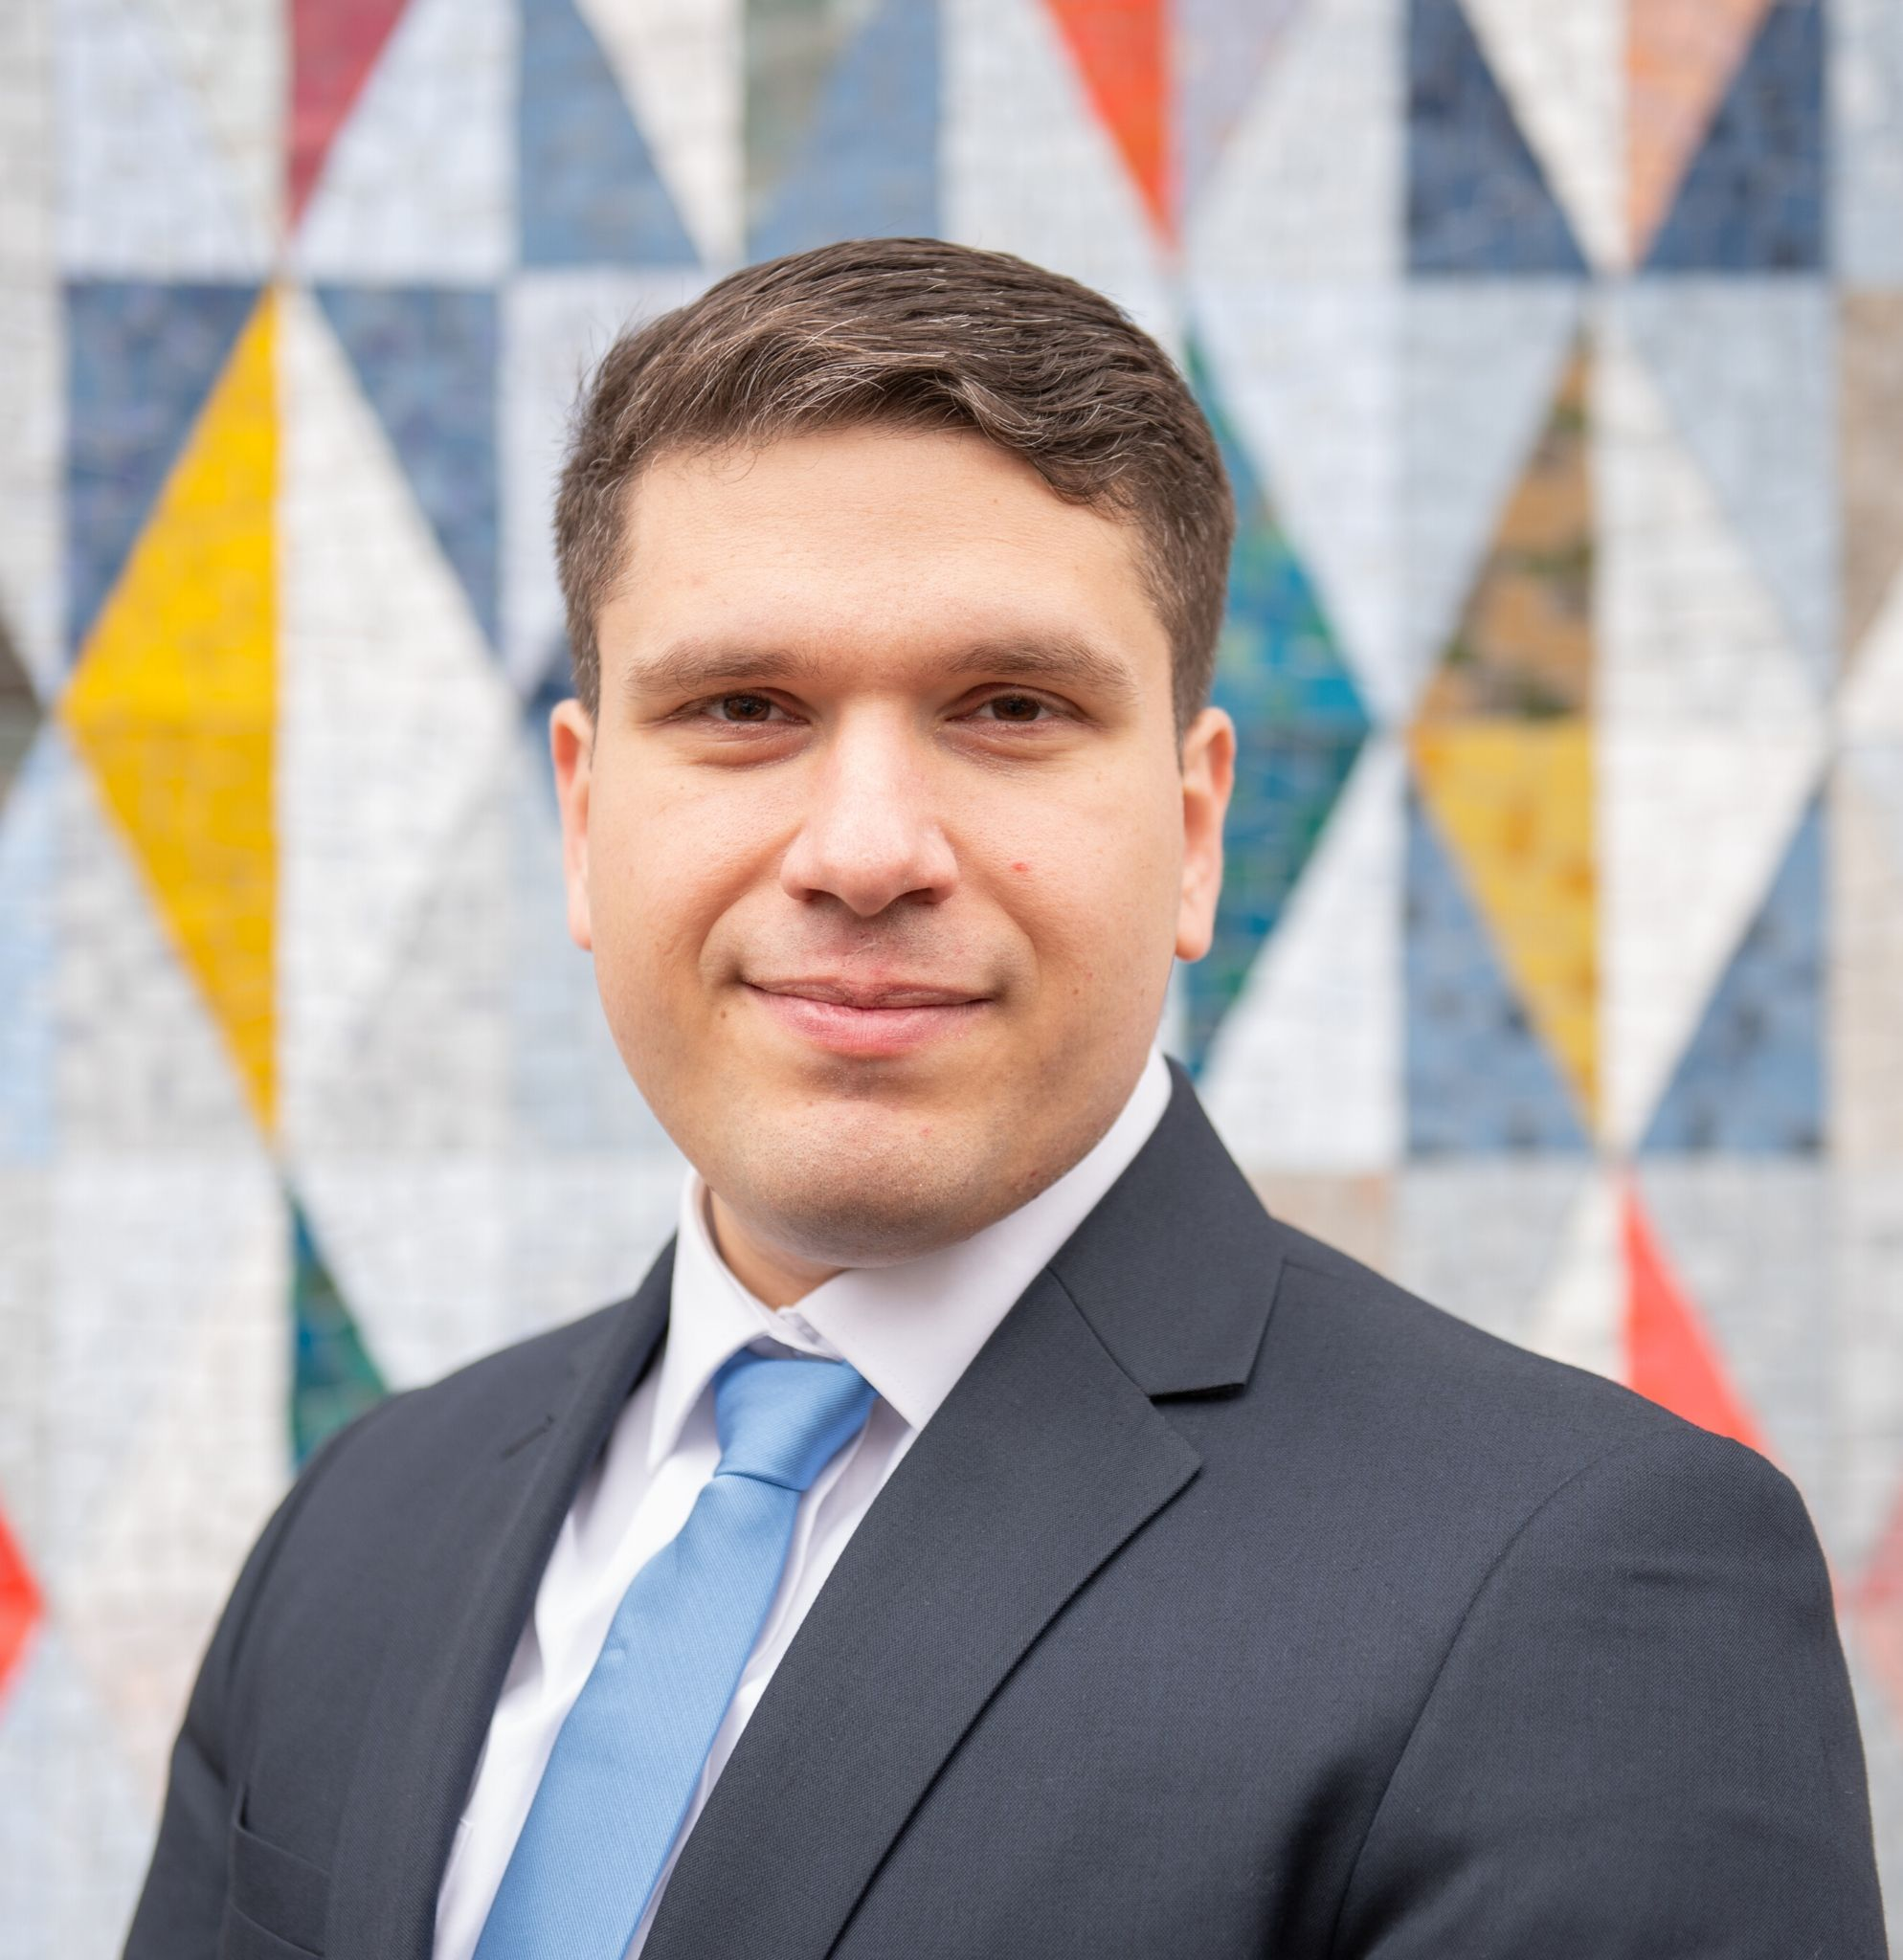 Trainer Estevan Belnomo